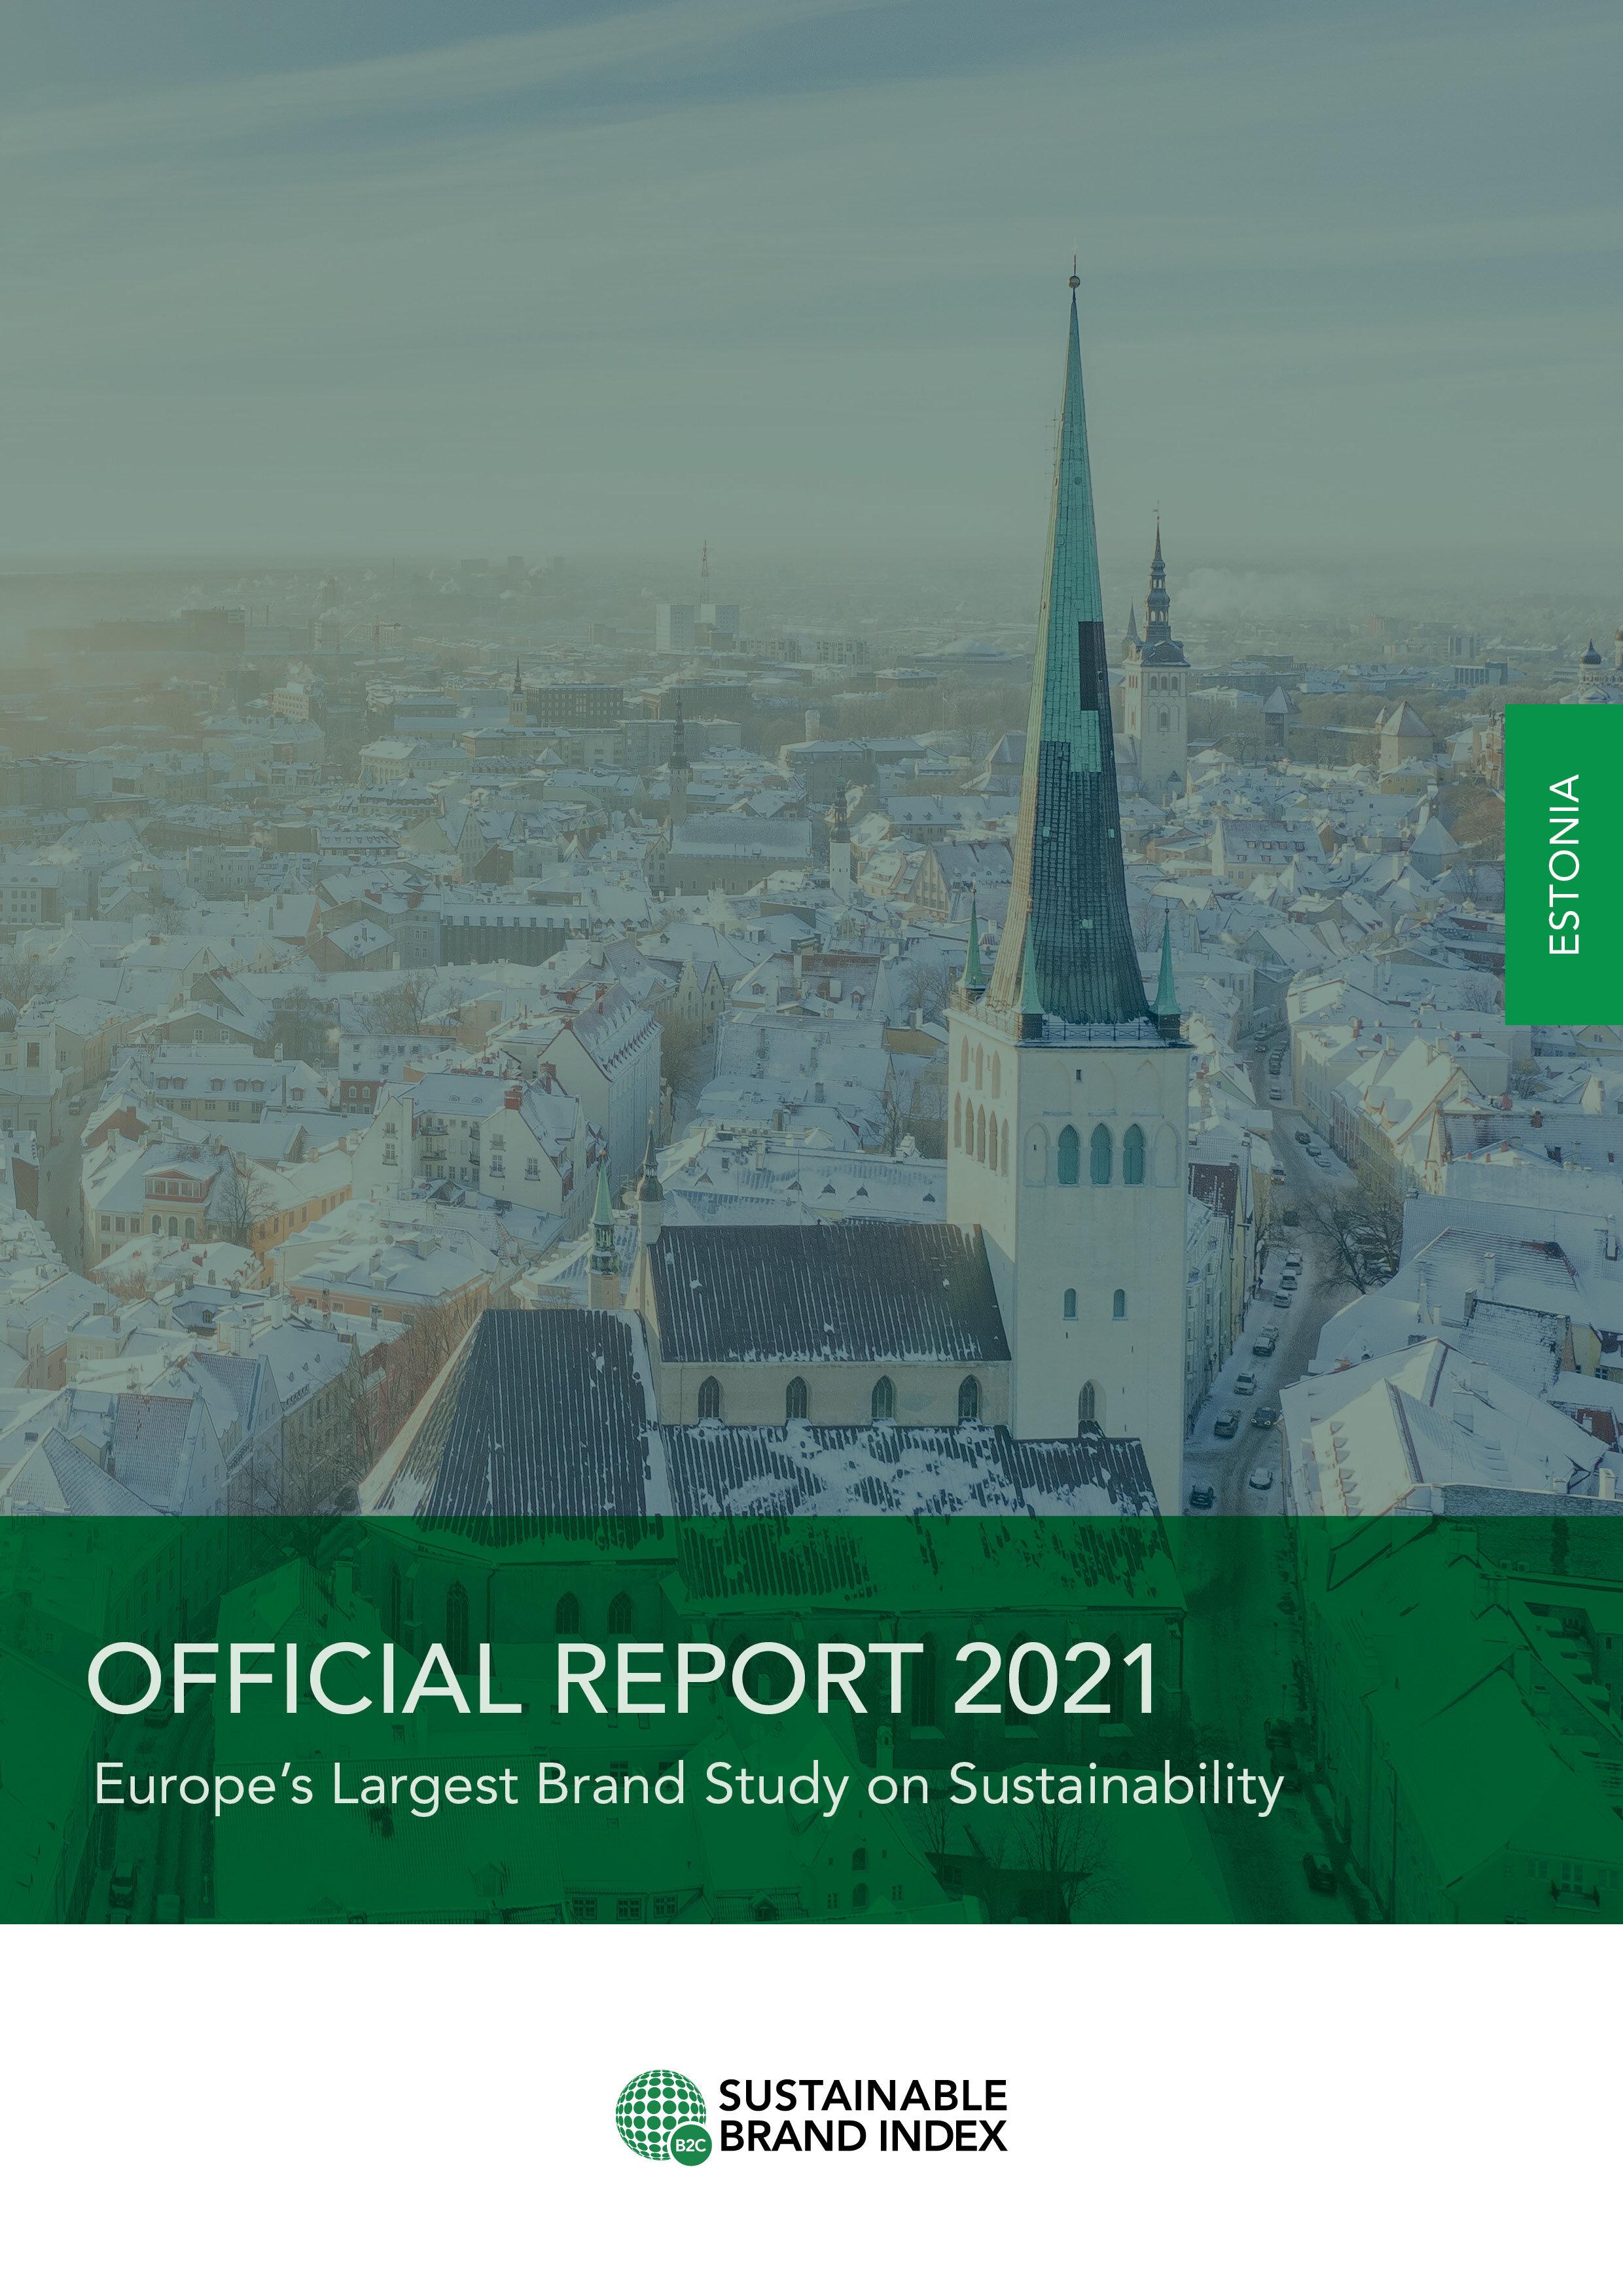 EST_Official Report_2021.jpg